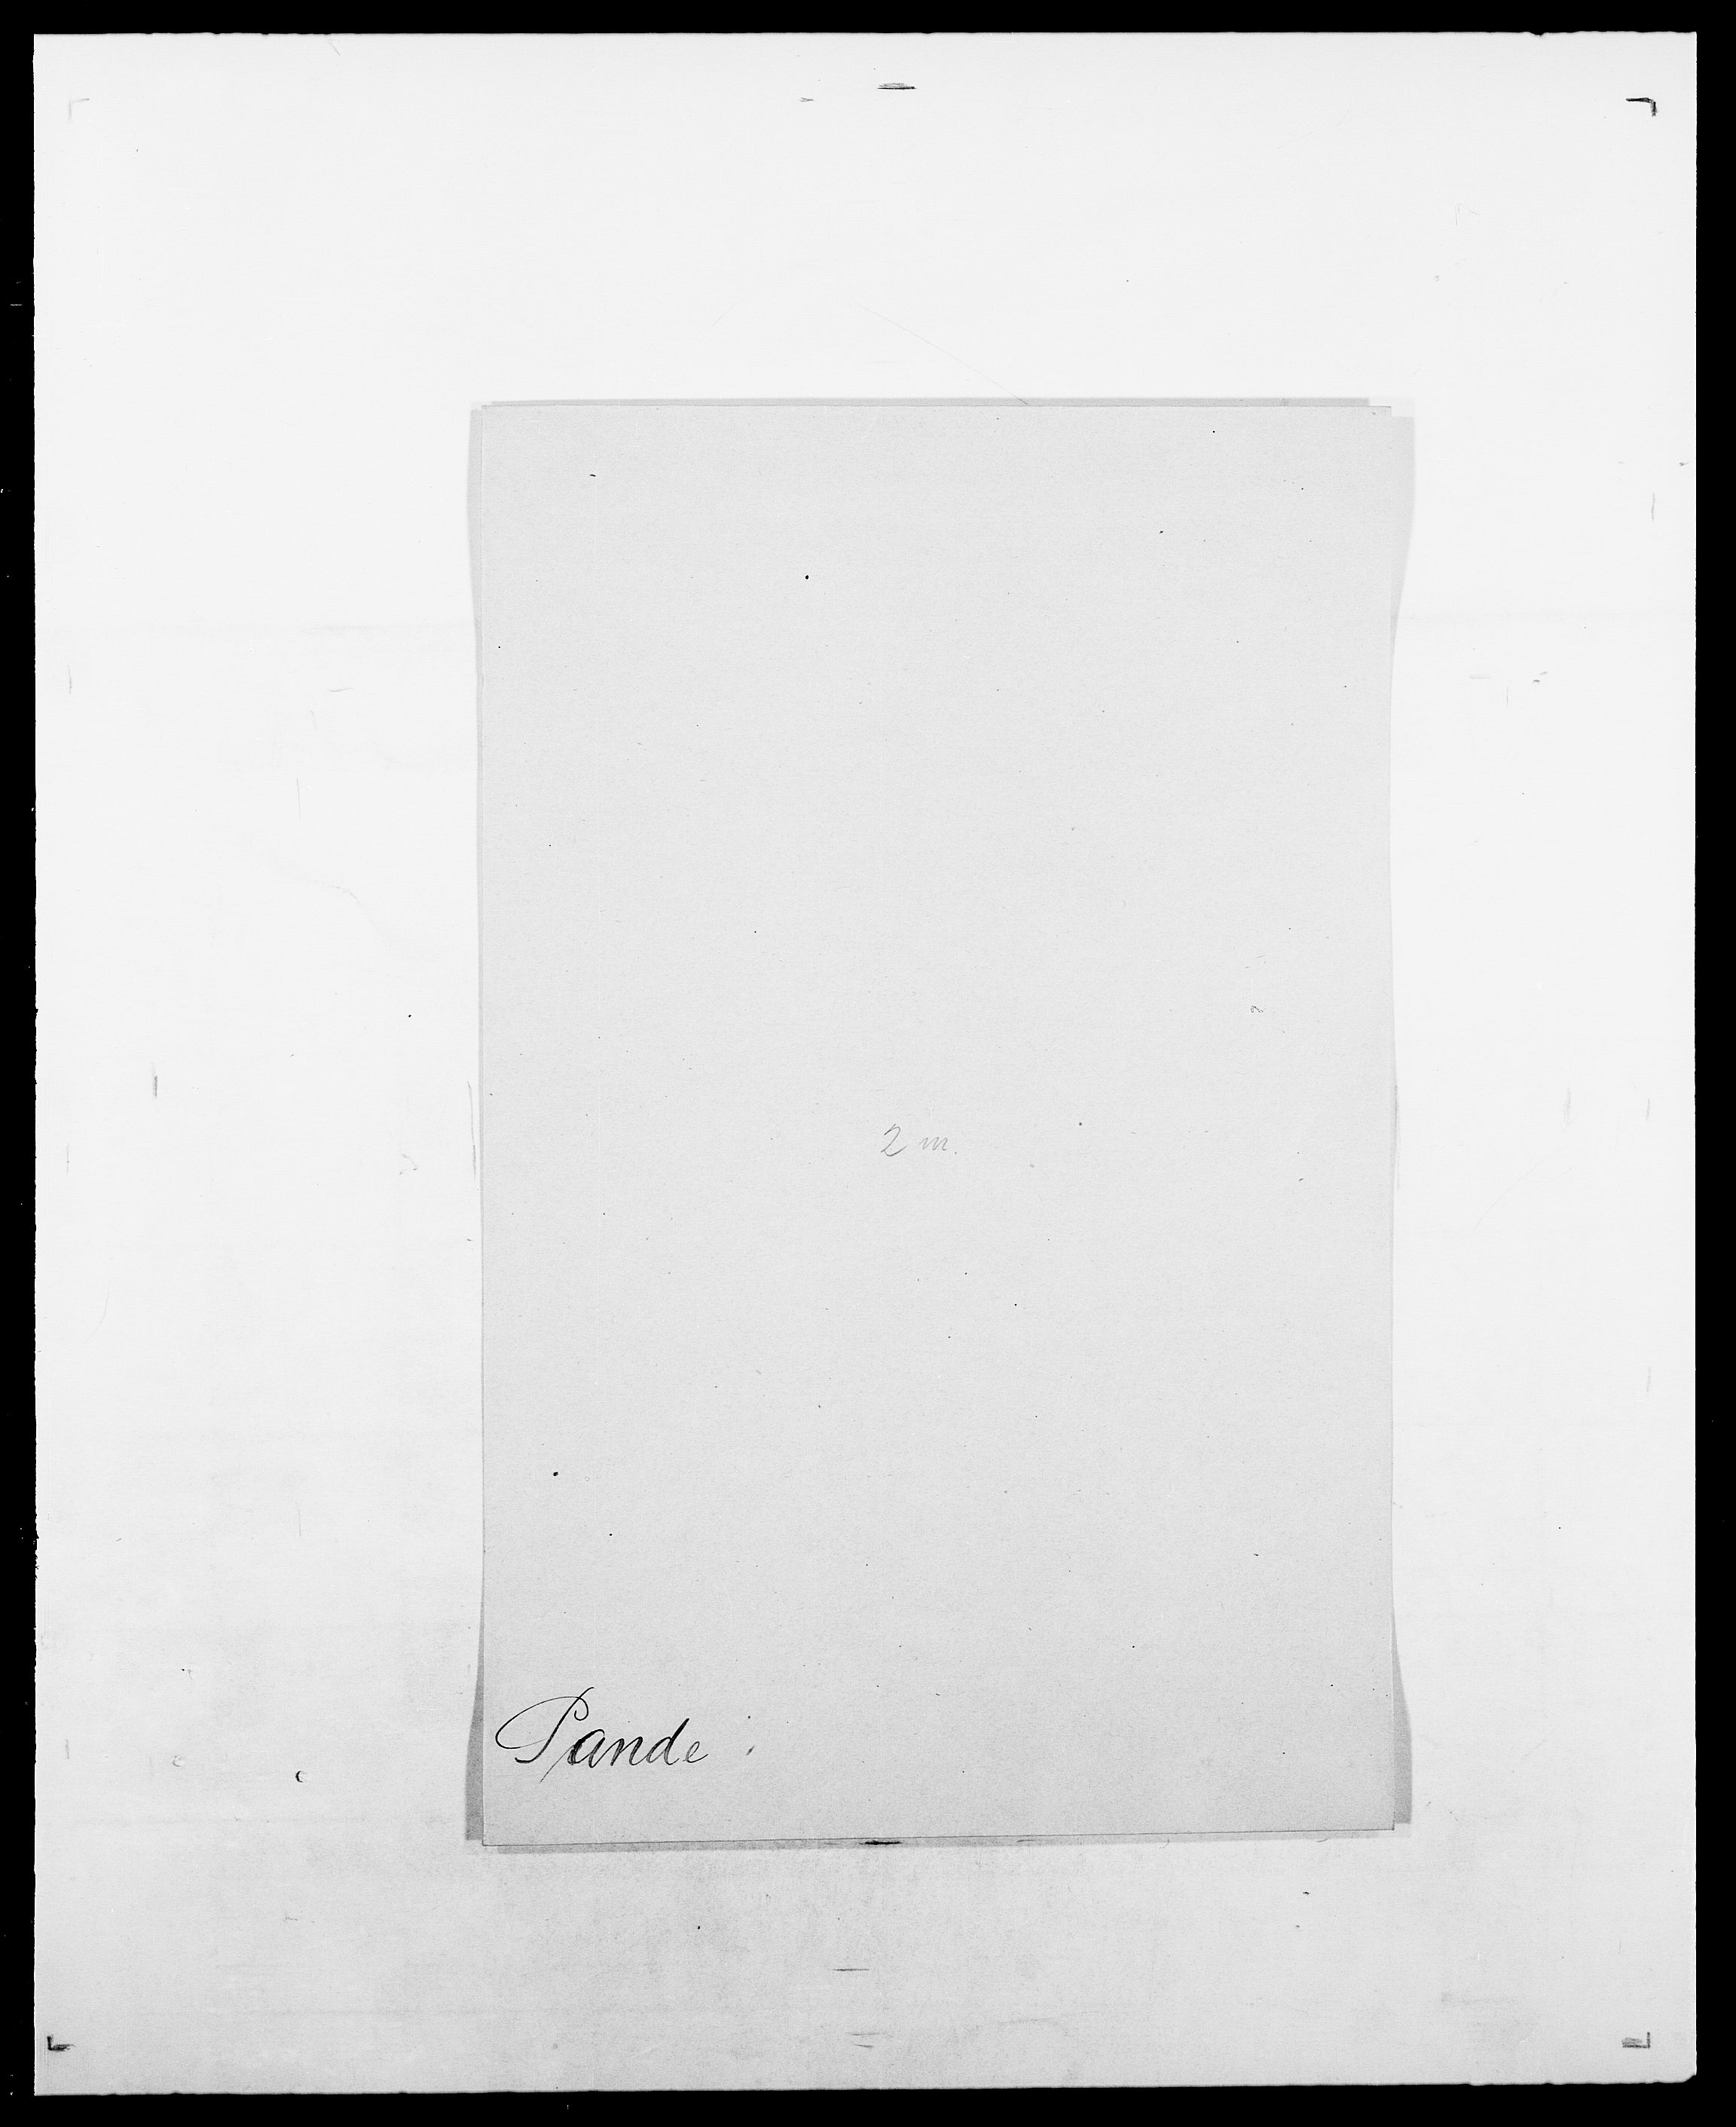 SAO, Delgobe, Charles Antoine - samling, D/Da/L0030: Paars - Pittelkov, s. 85